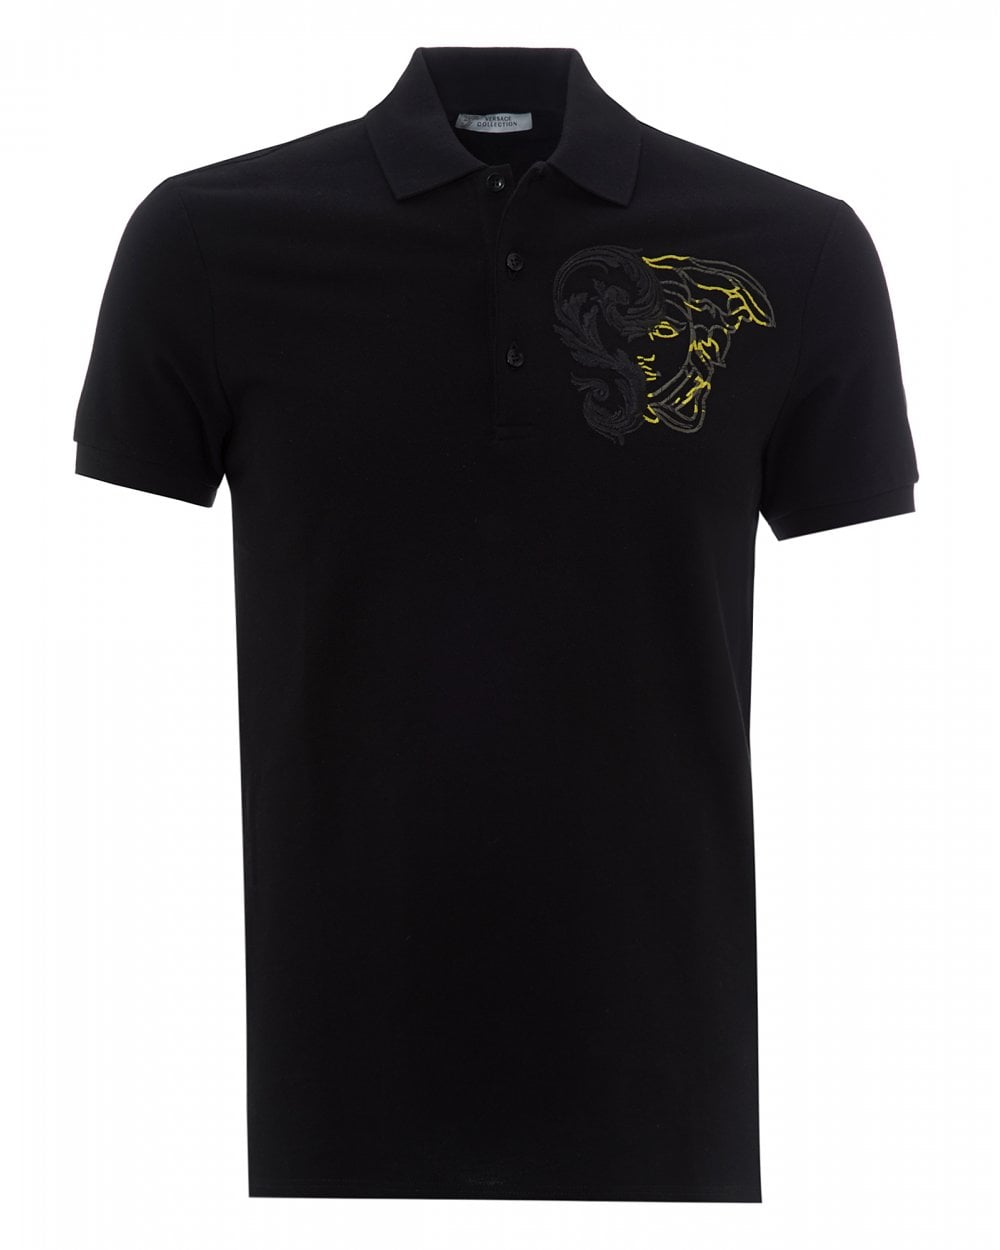 7f908a005d76 Versace Collection Mens Embroidered Half Medusa Polo, Black Polo Shirt